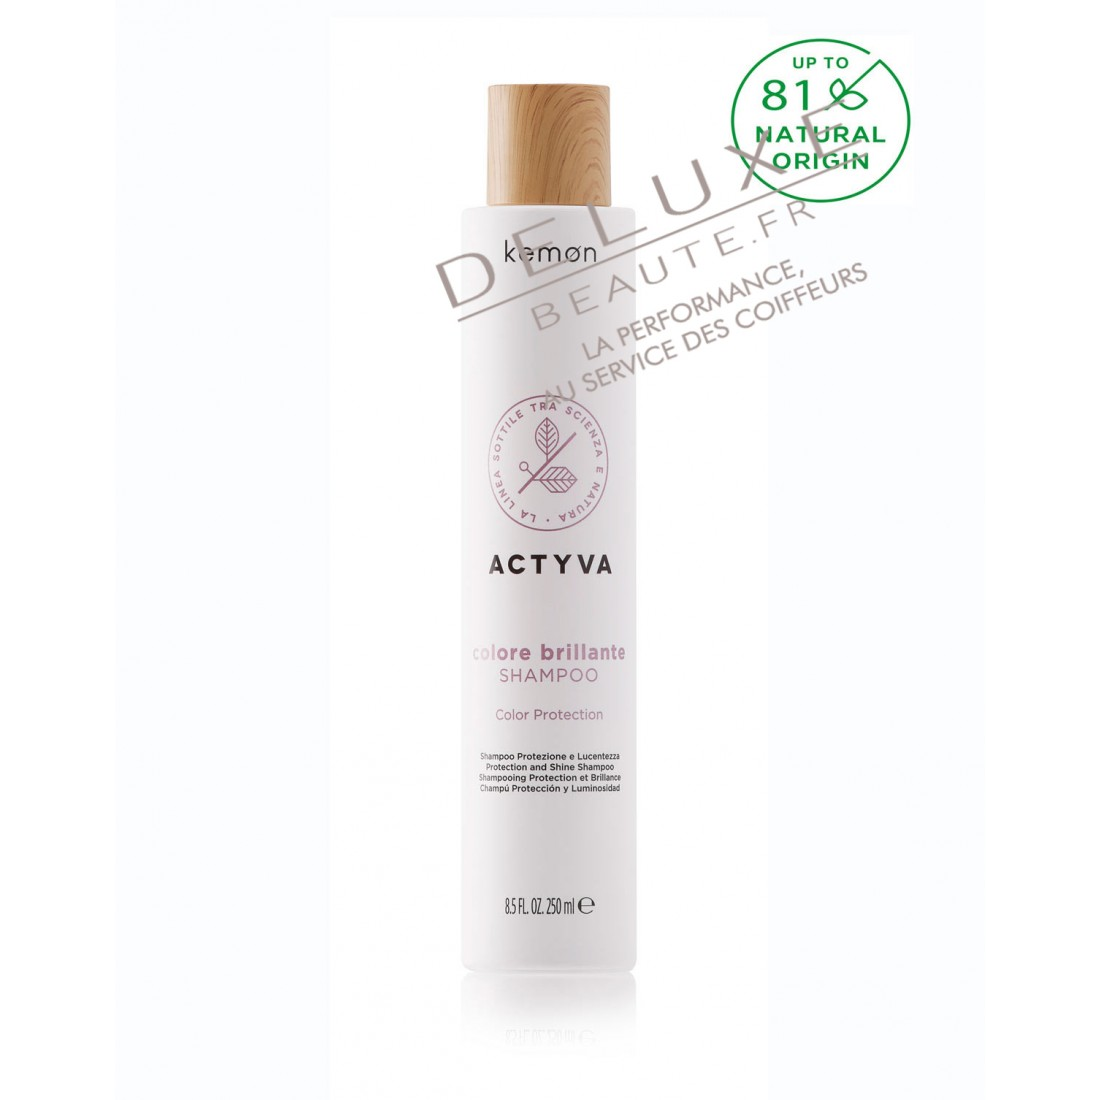 SHAMPOING COLORE BRILLANTE ACTYVA Cheveux Colorés VELIAN Complex